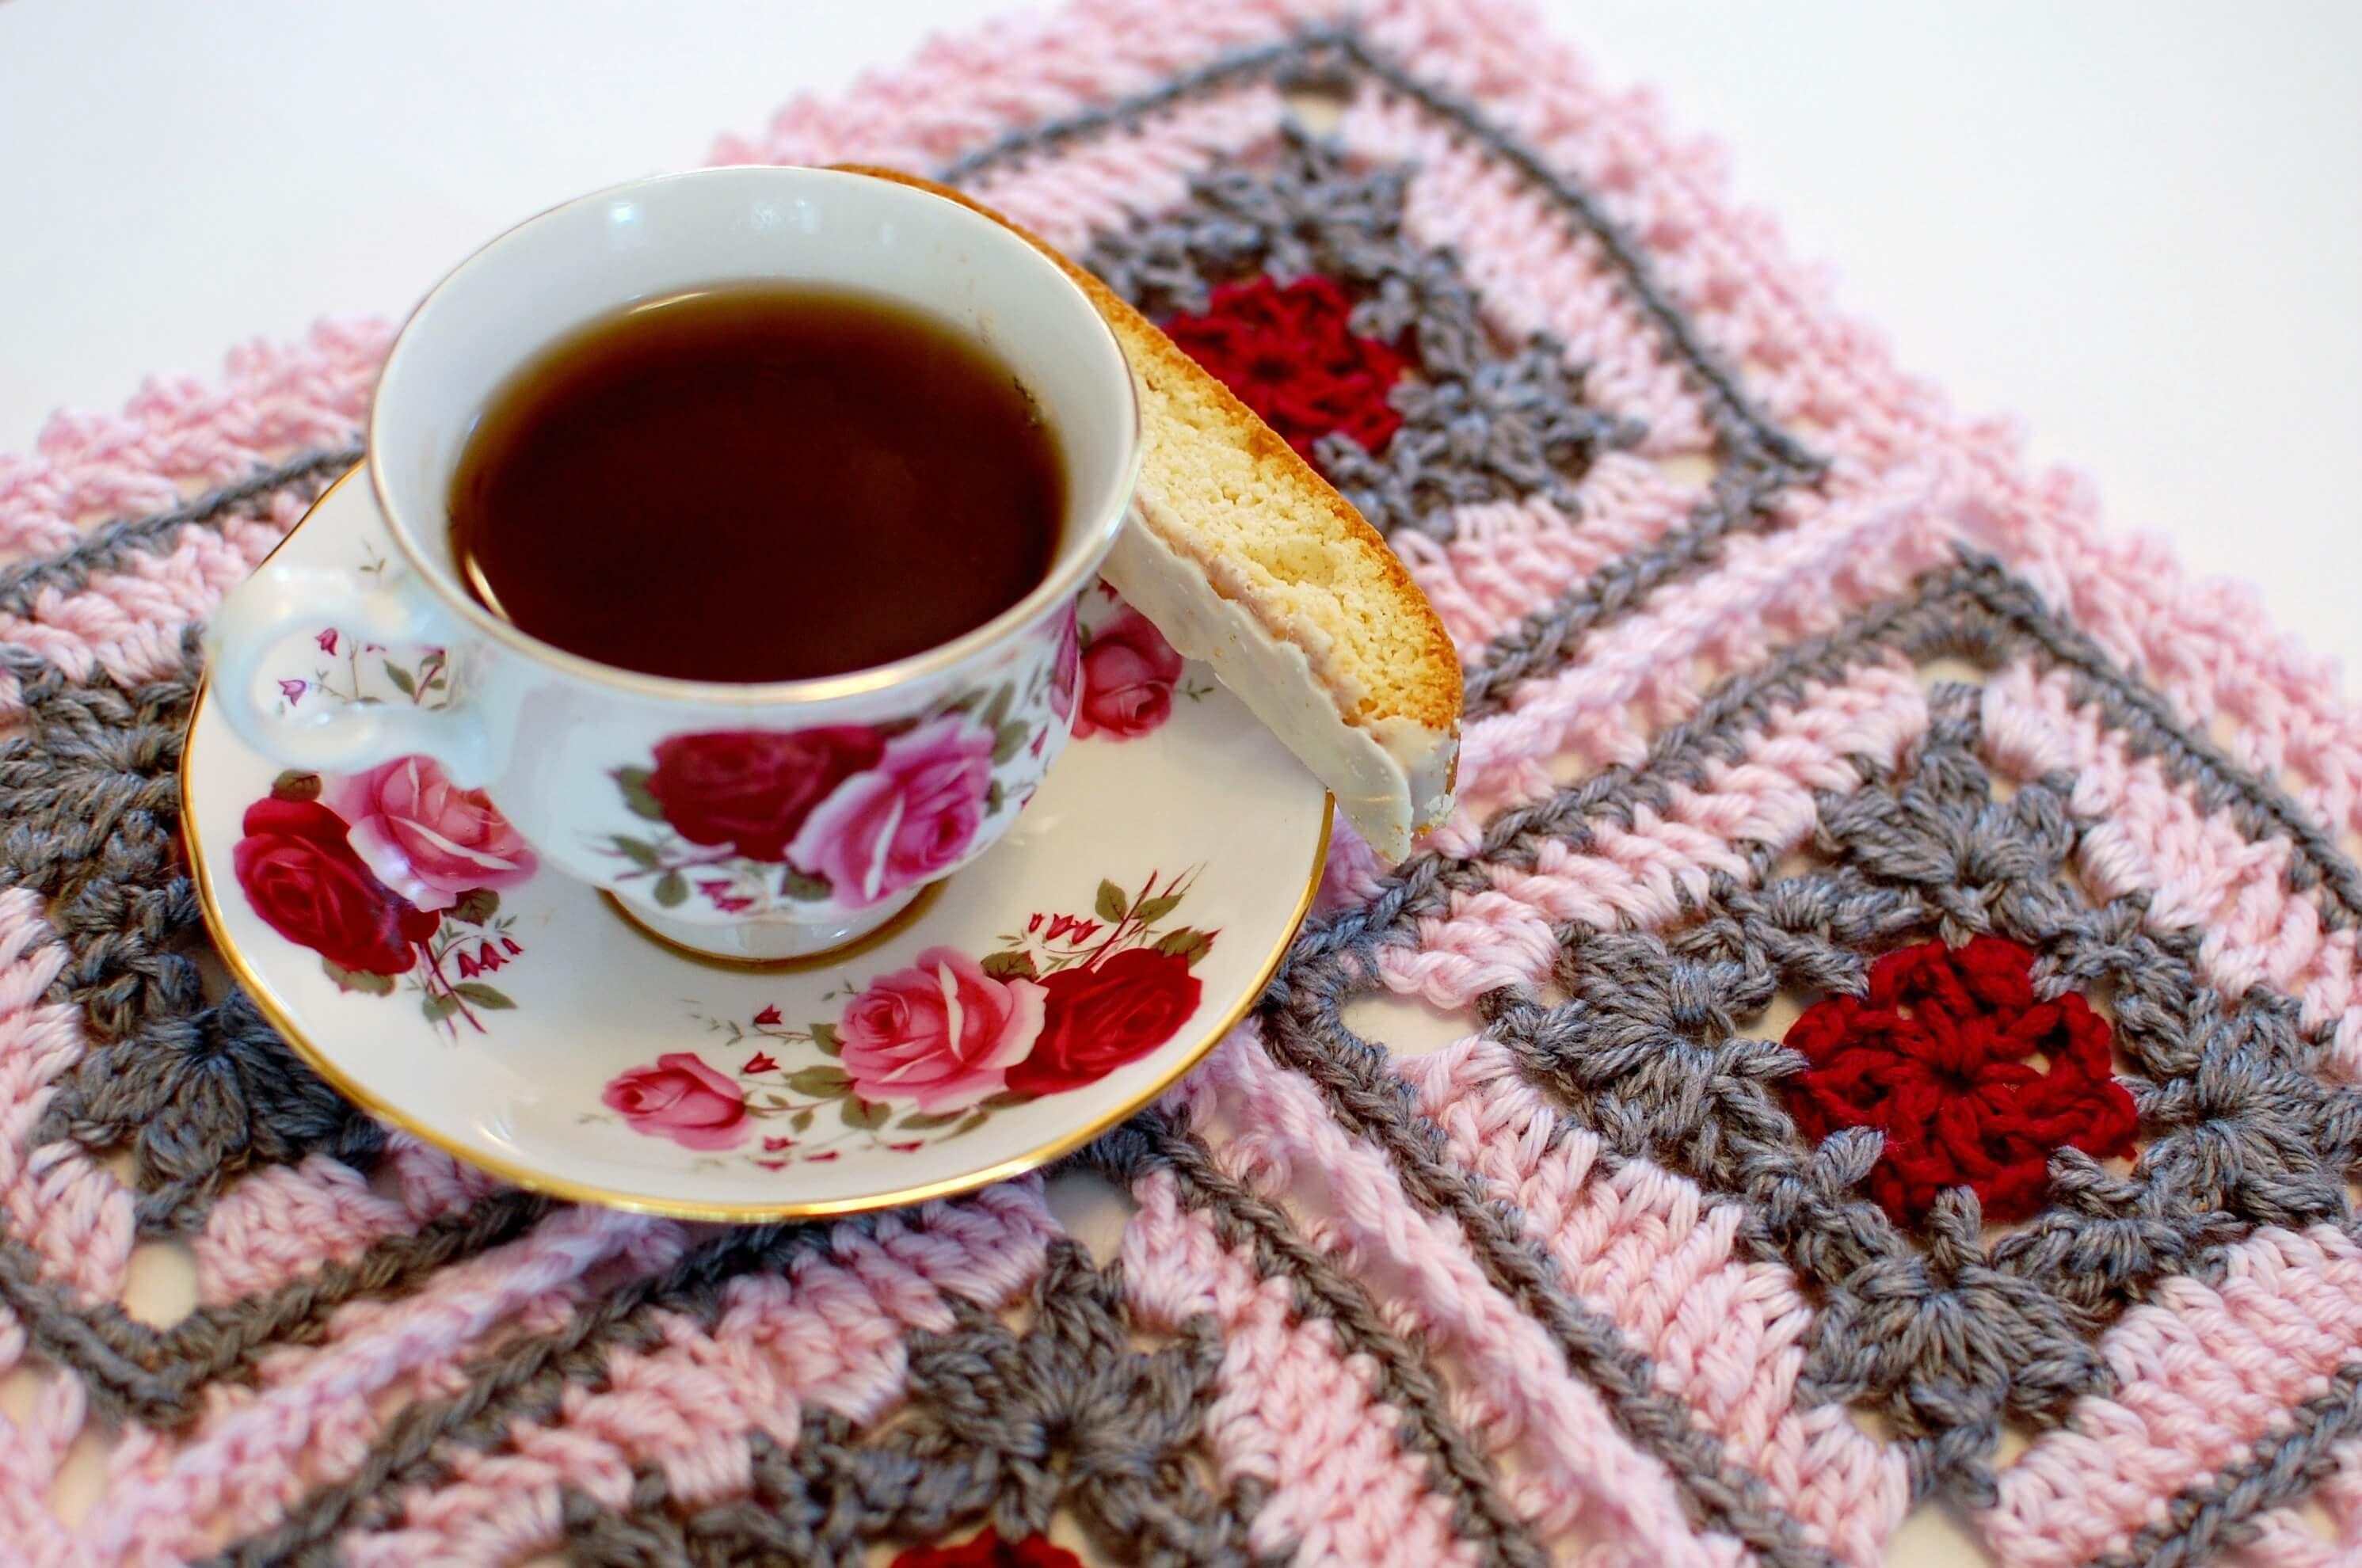 Free Motif Patterns · Special Surprise: Free Crochet Motif Pattern